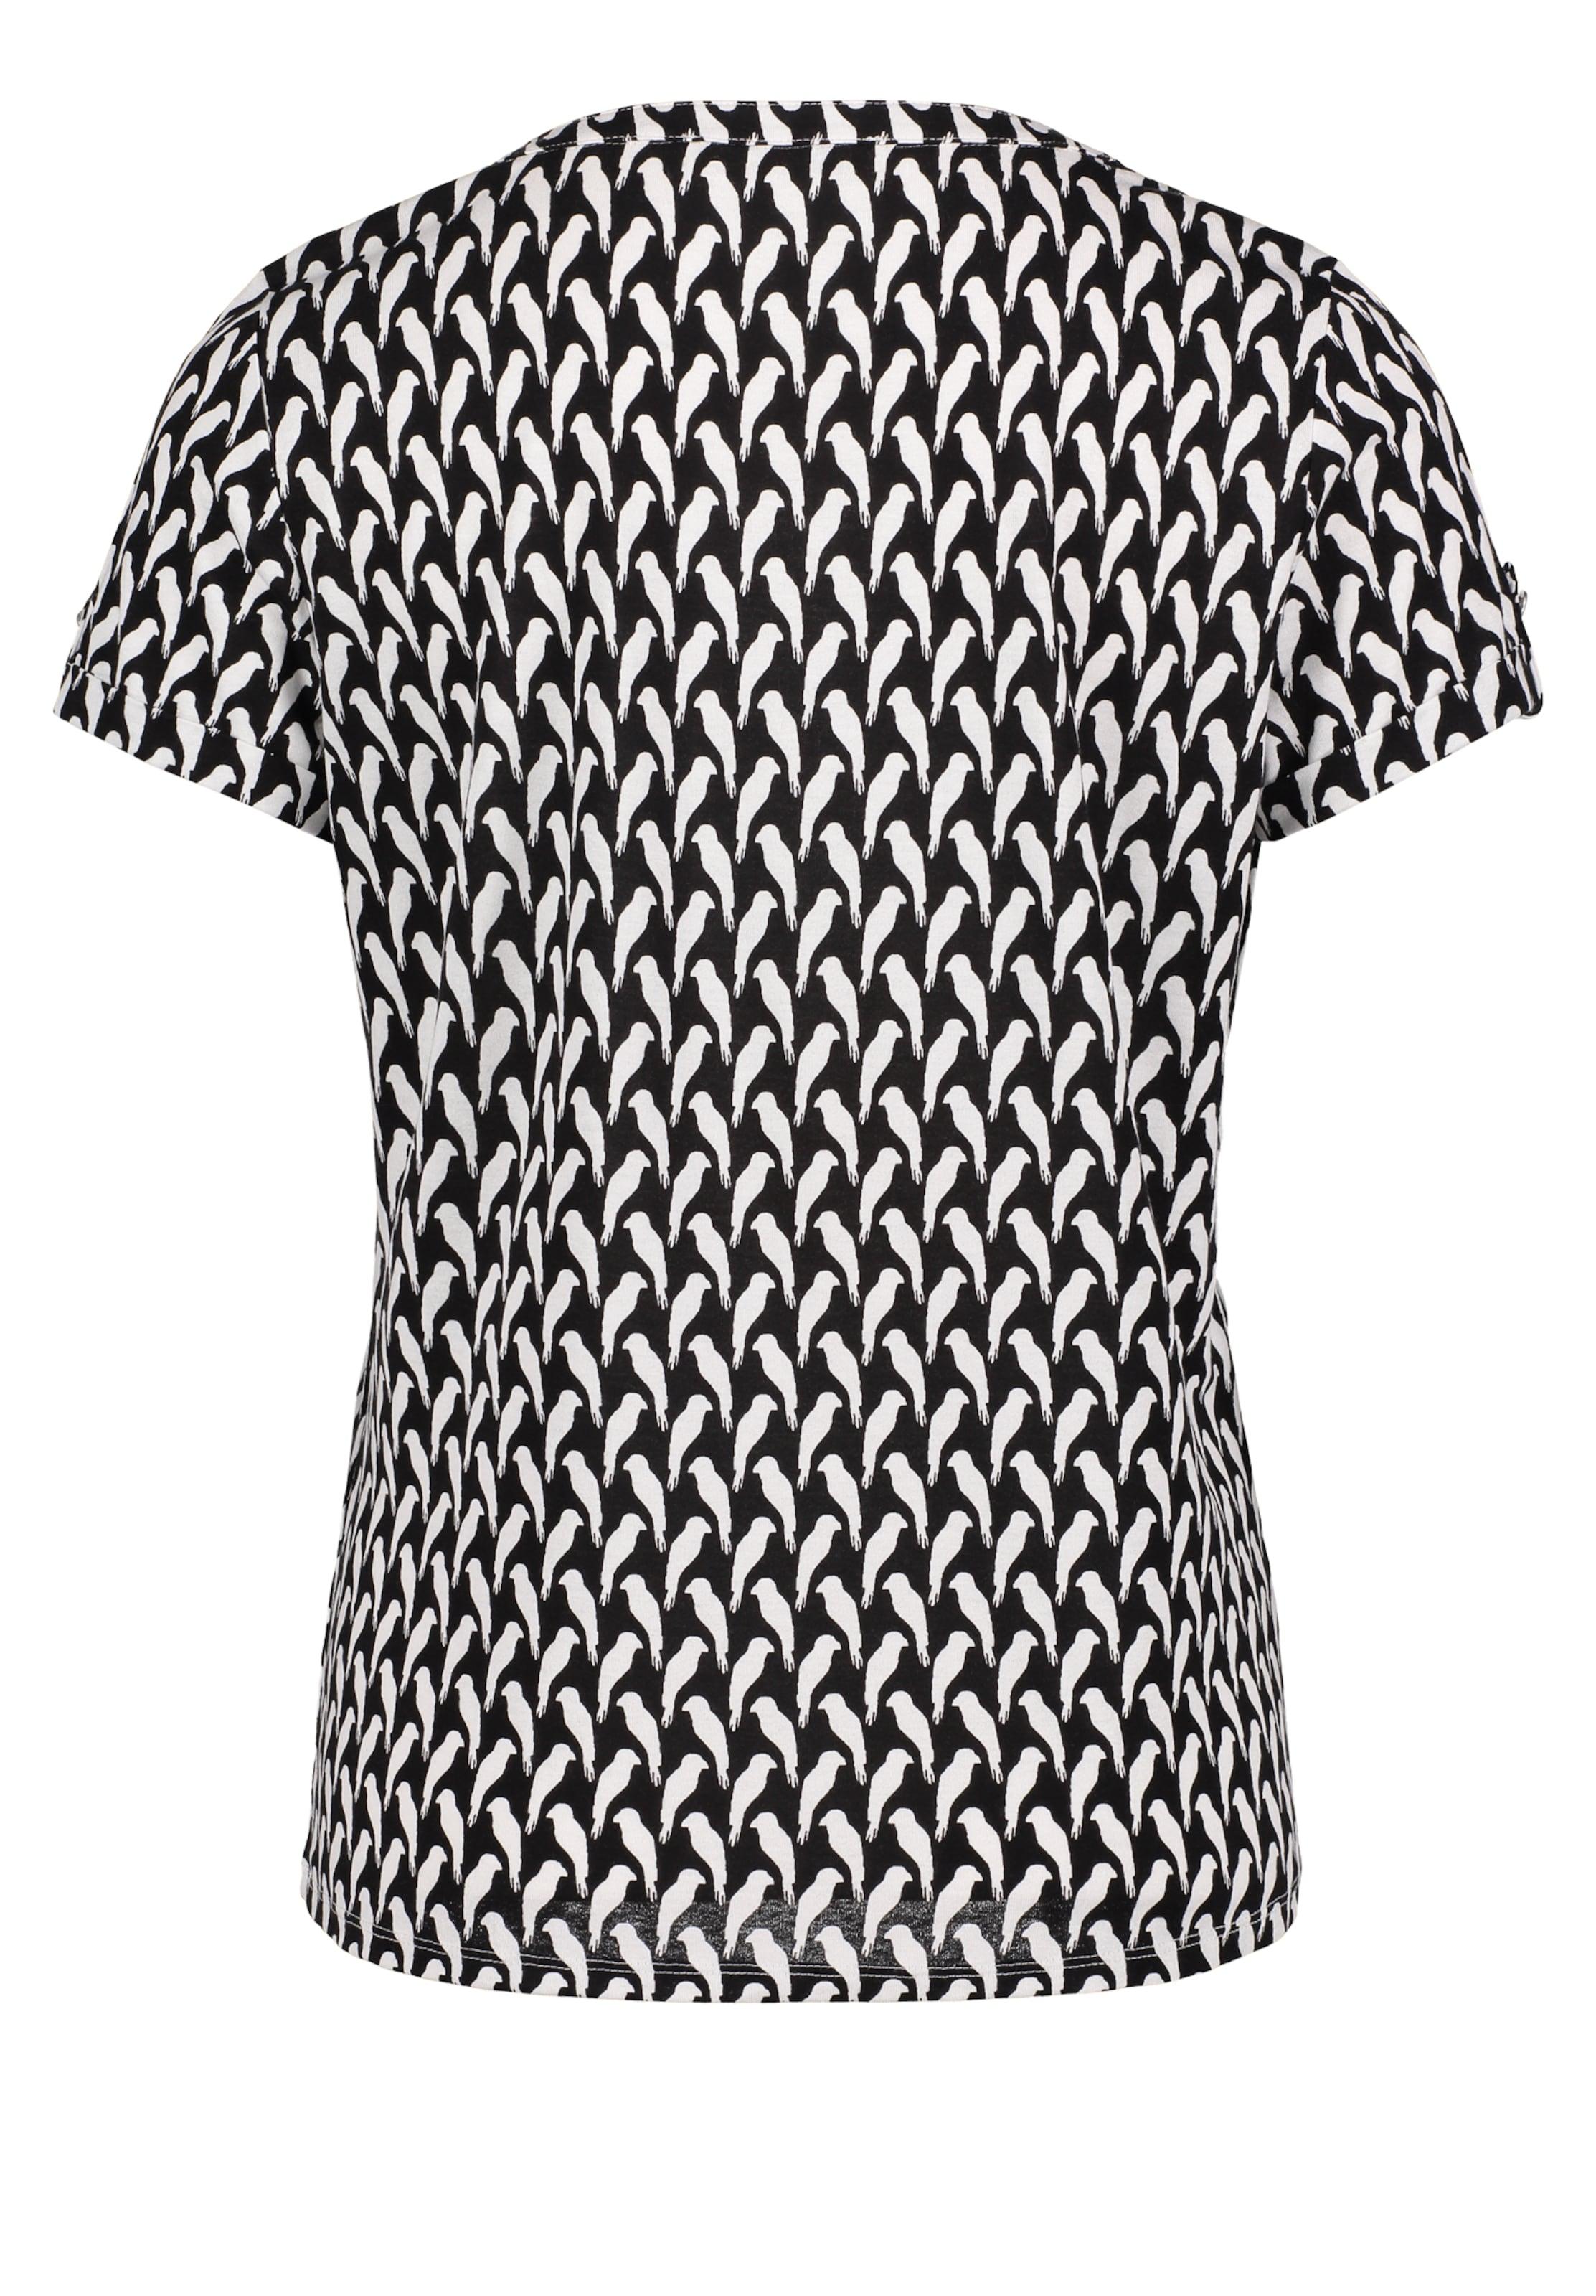 Betty Shirt In SchwarzWeiß Barclay Betty Barclay Shirt Betty Barclay SchwarzWeiß In 76gvYfby